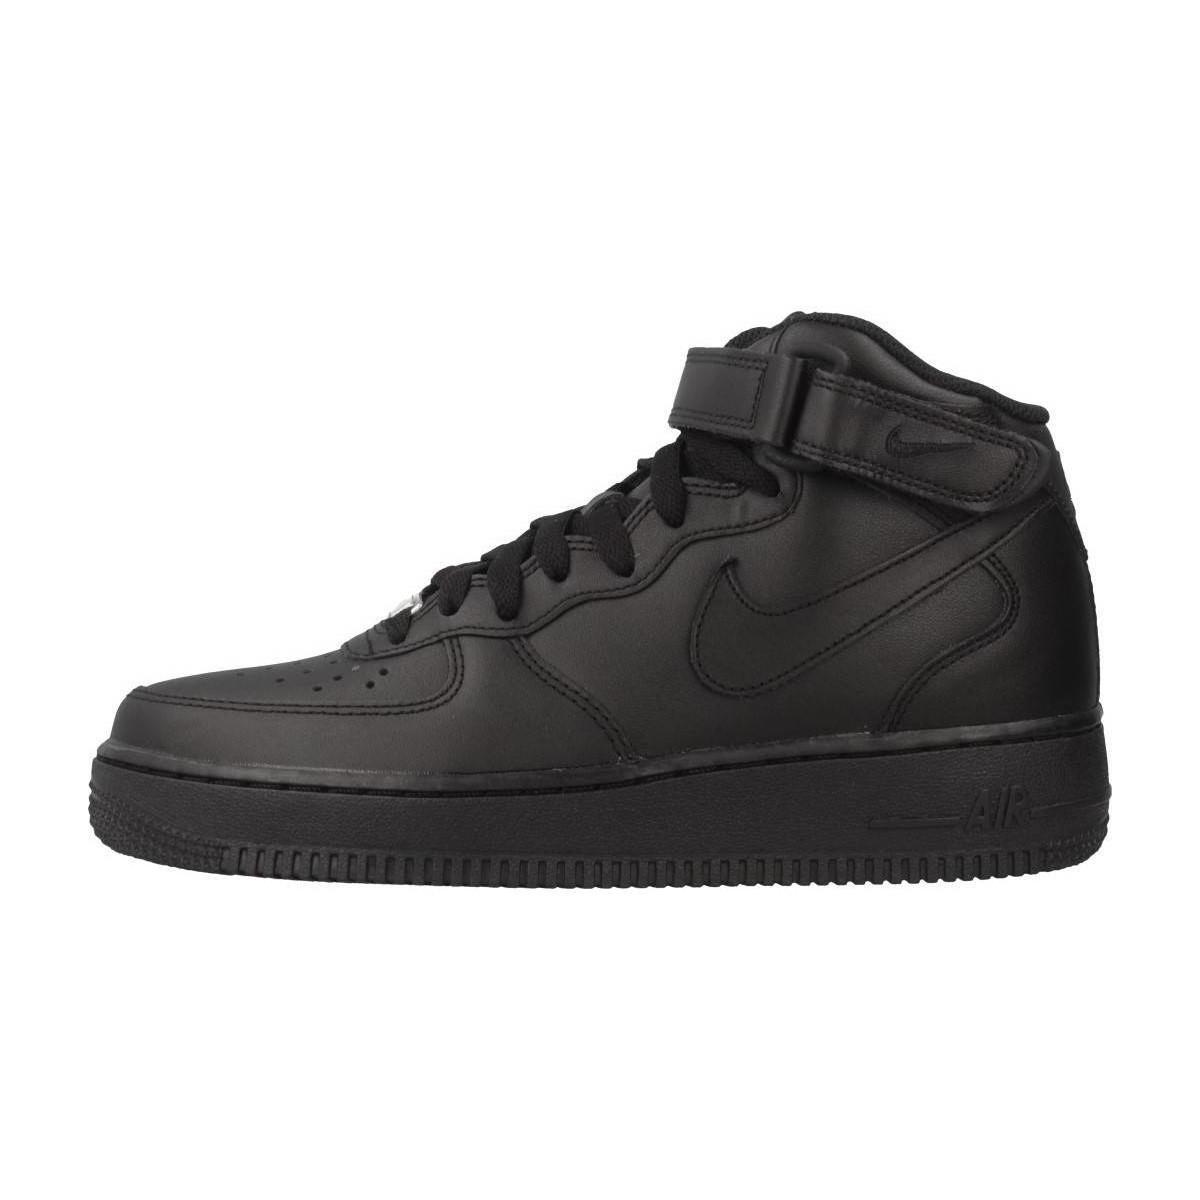 Shoeshigh Air Force 1 Top Nike TrainersIn Black Women's SUzMGVpq